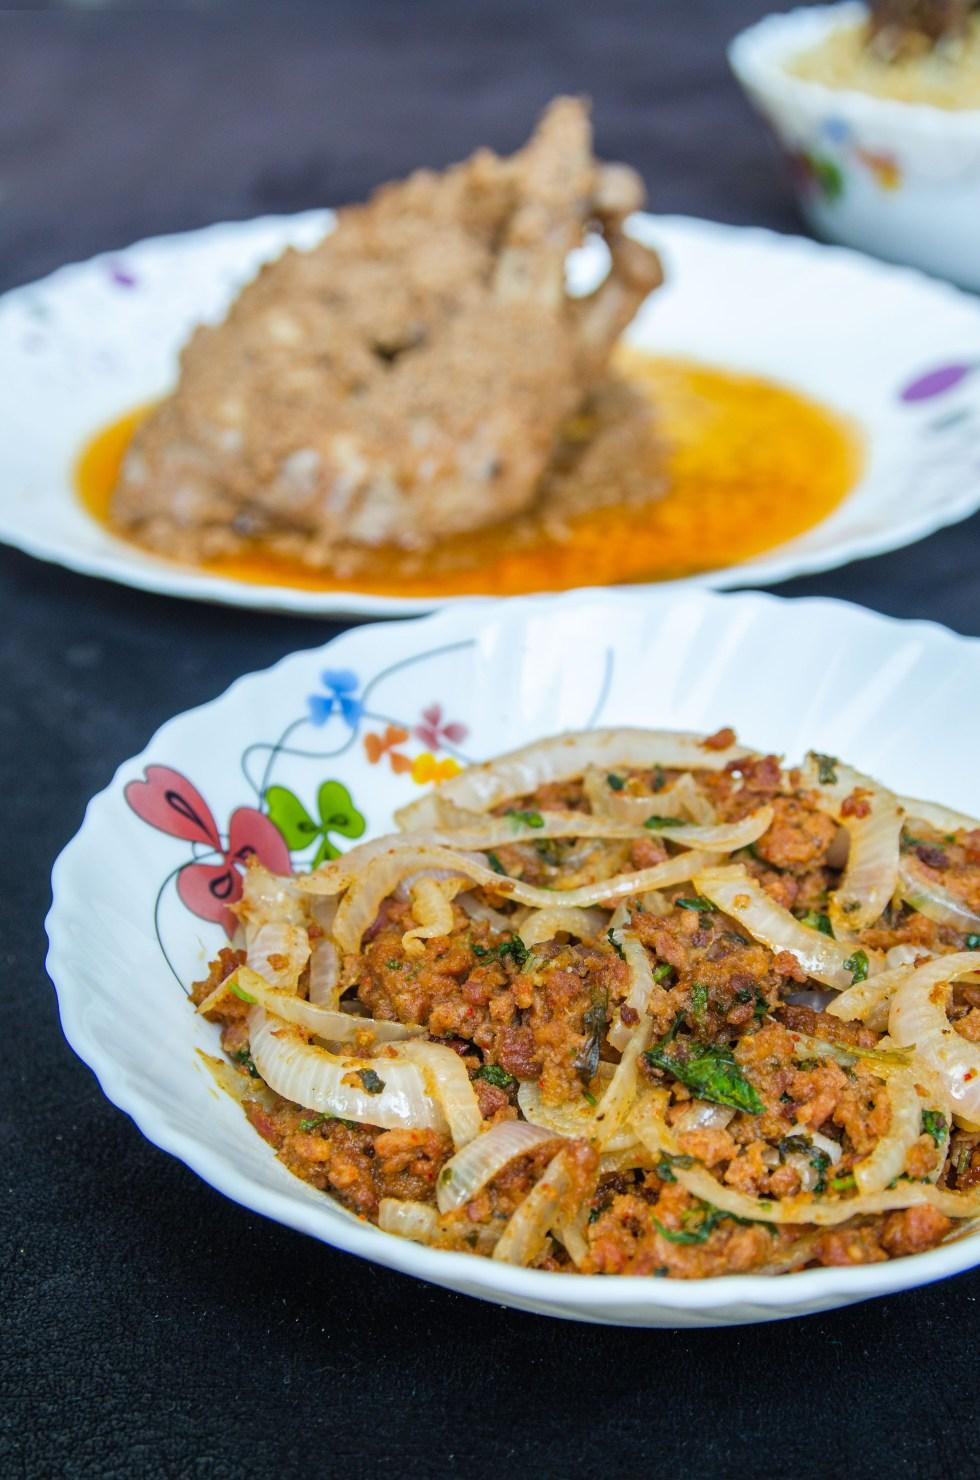 Mutton Shaami Kebab Bhurji from Haan D Biryani